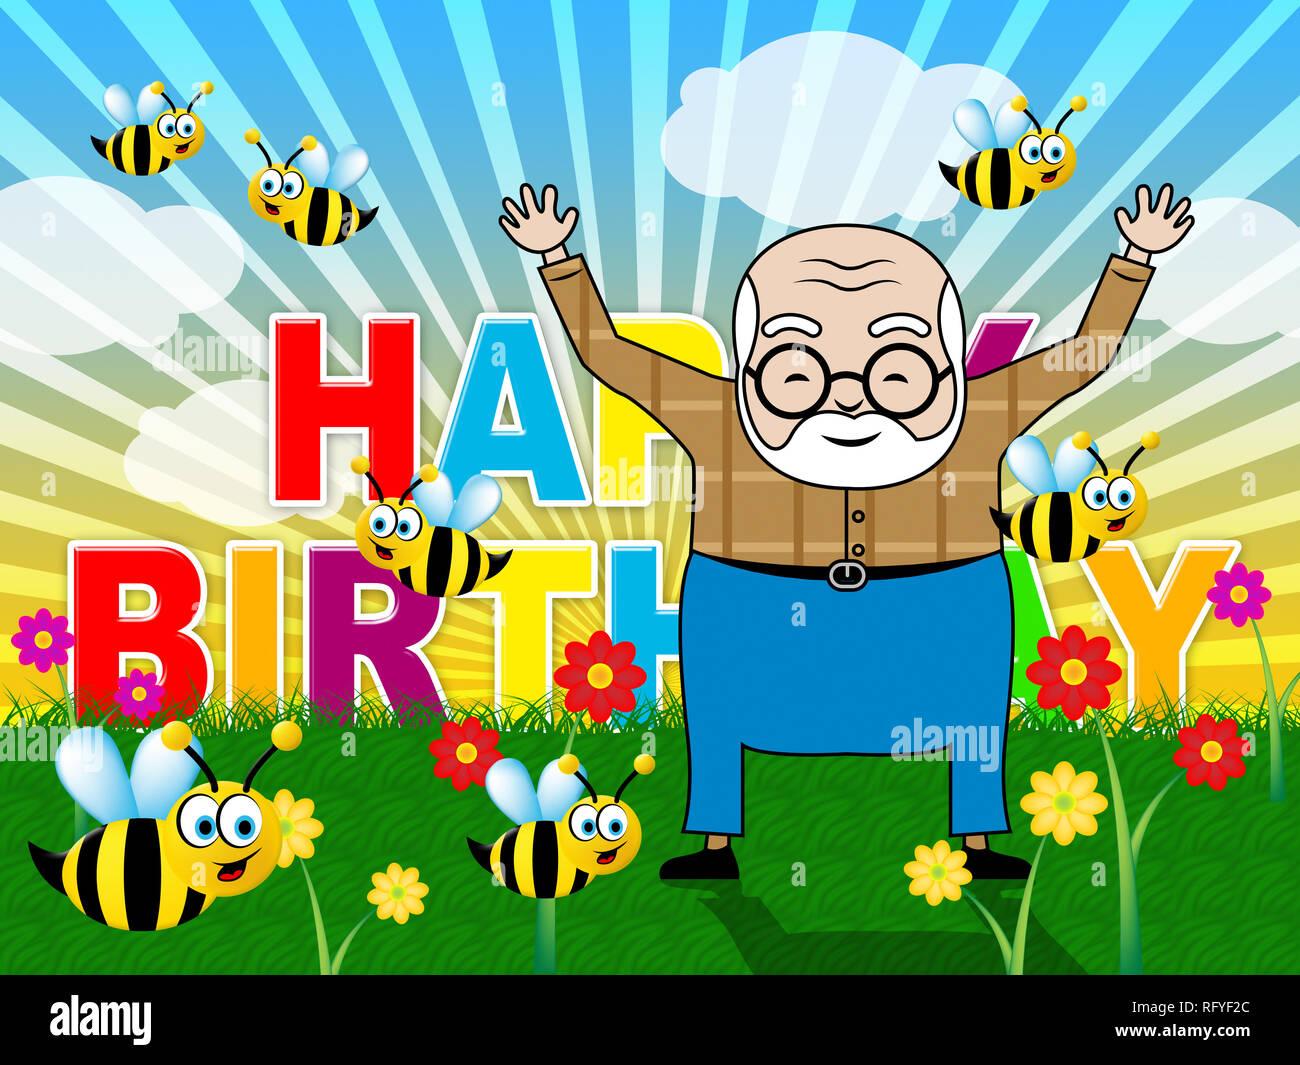 Alles Gute Zum Geburtstag Opa Karte Als Uberraschung Gruss Fur Opa